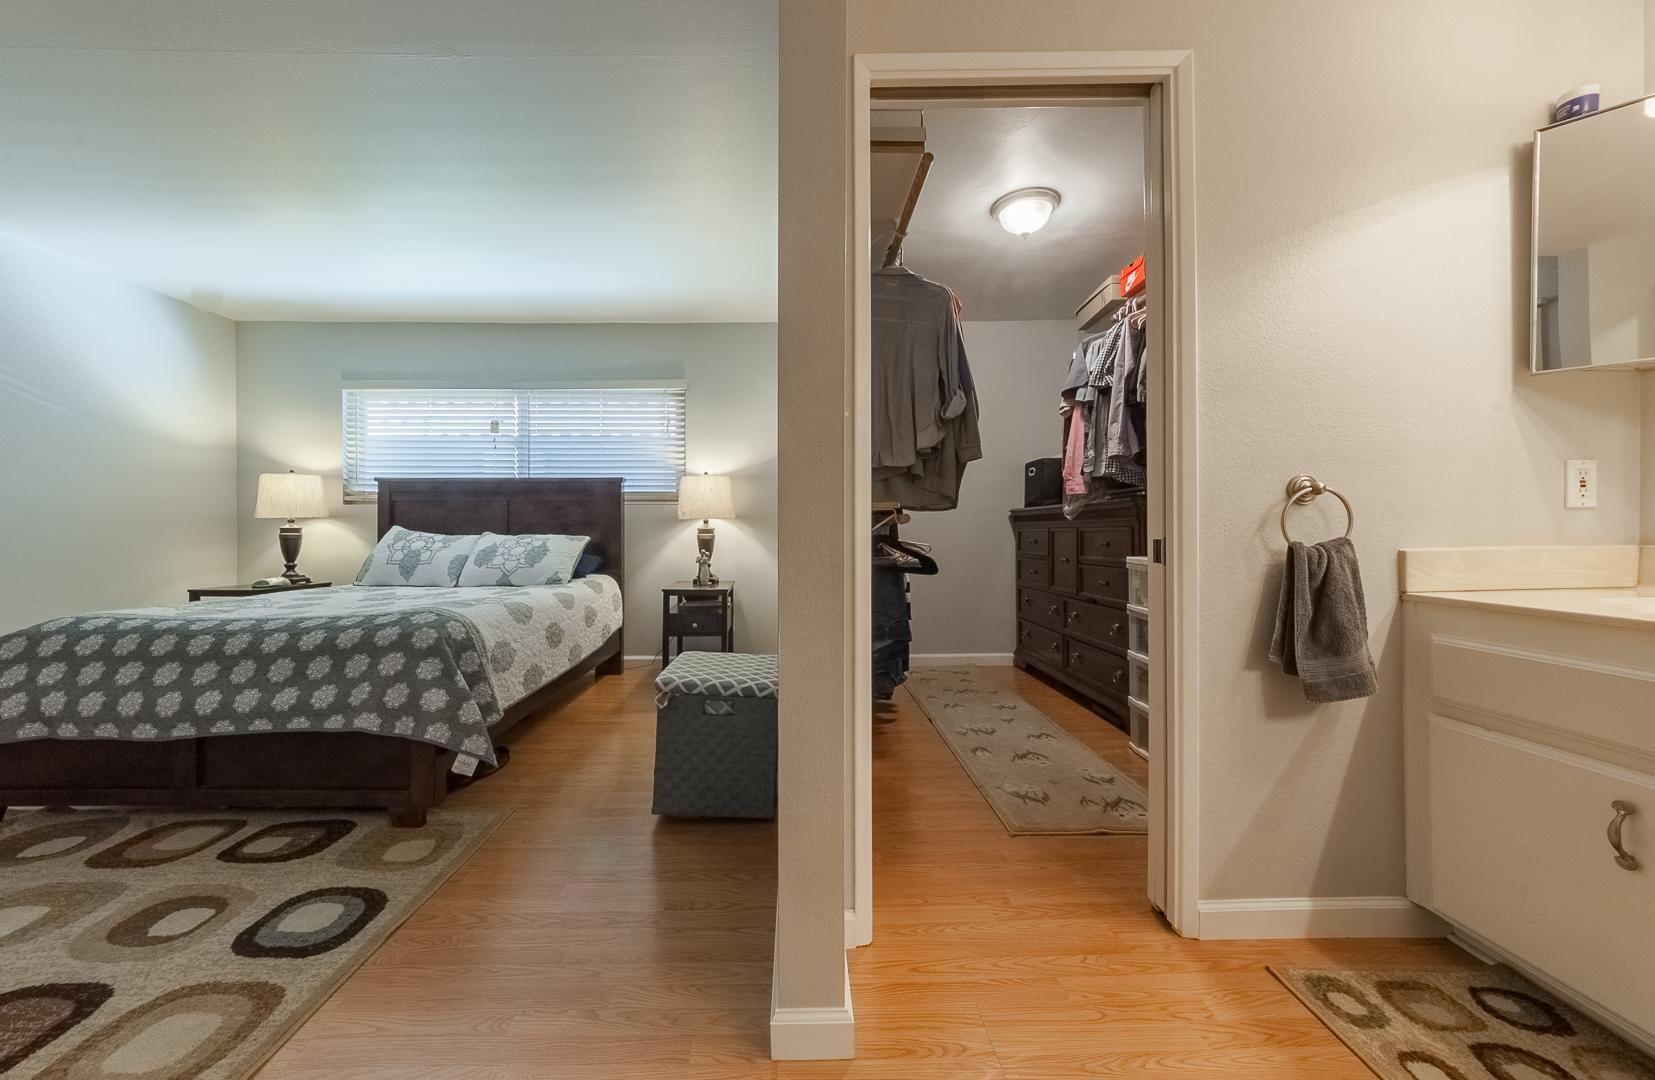 7 - Bedroom and closet